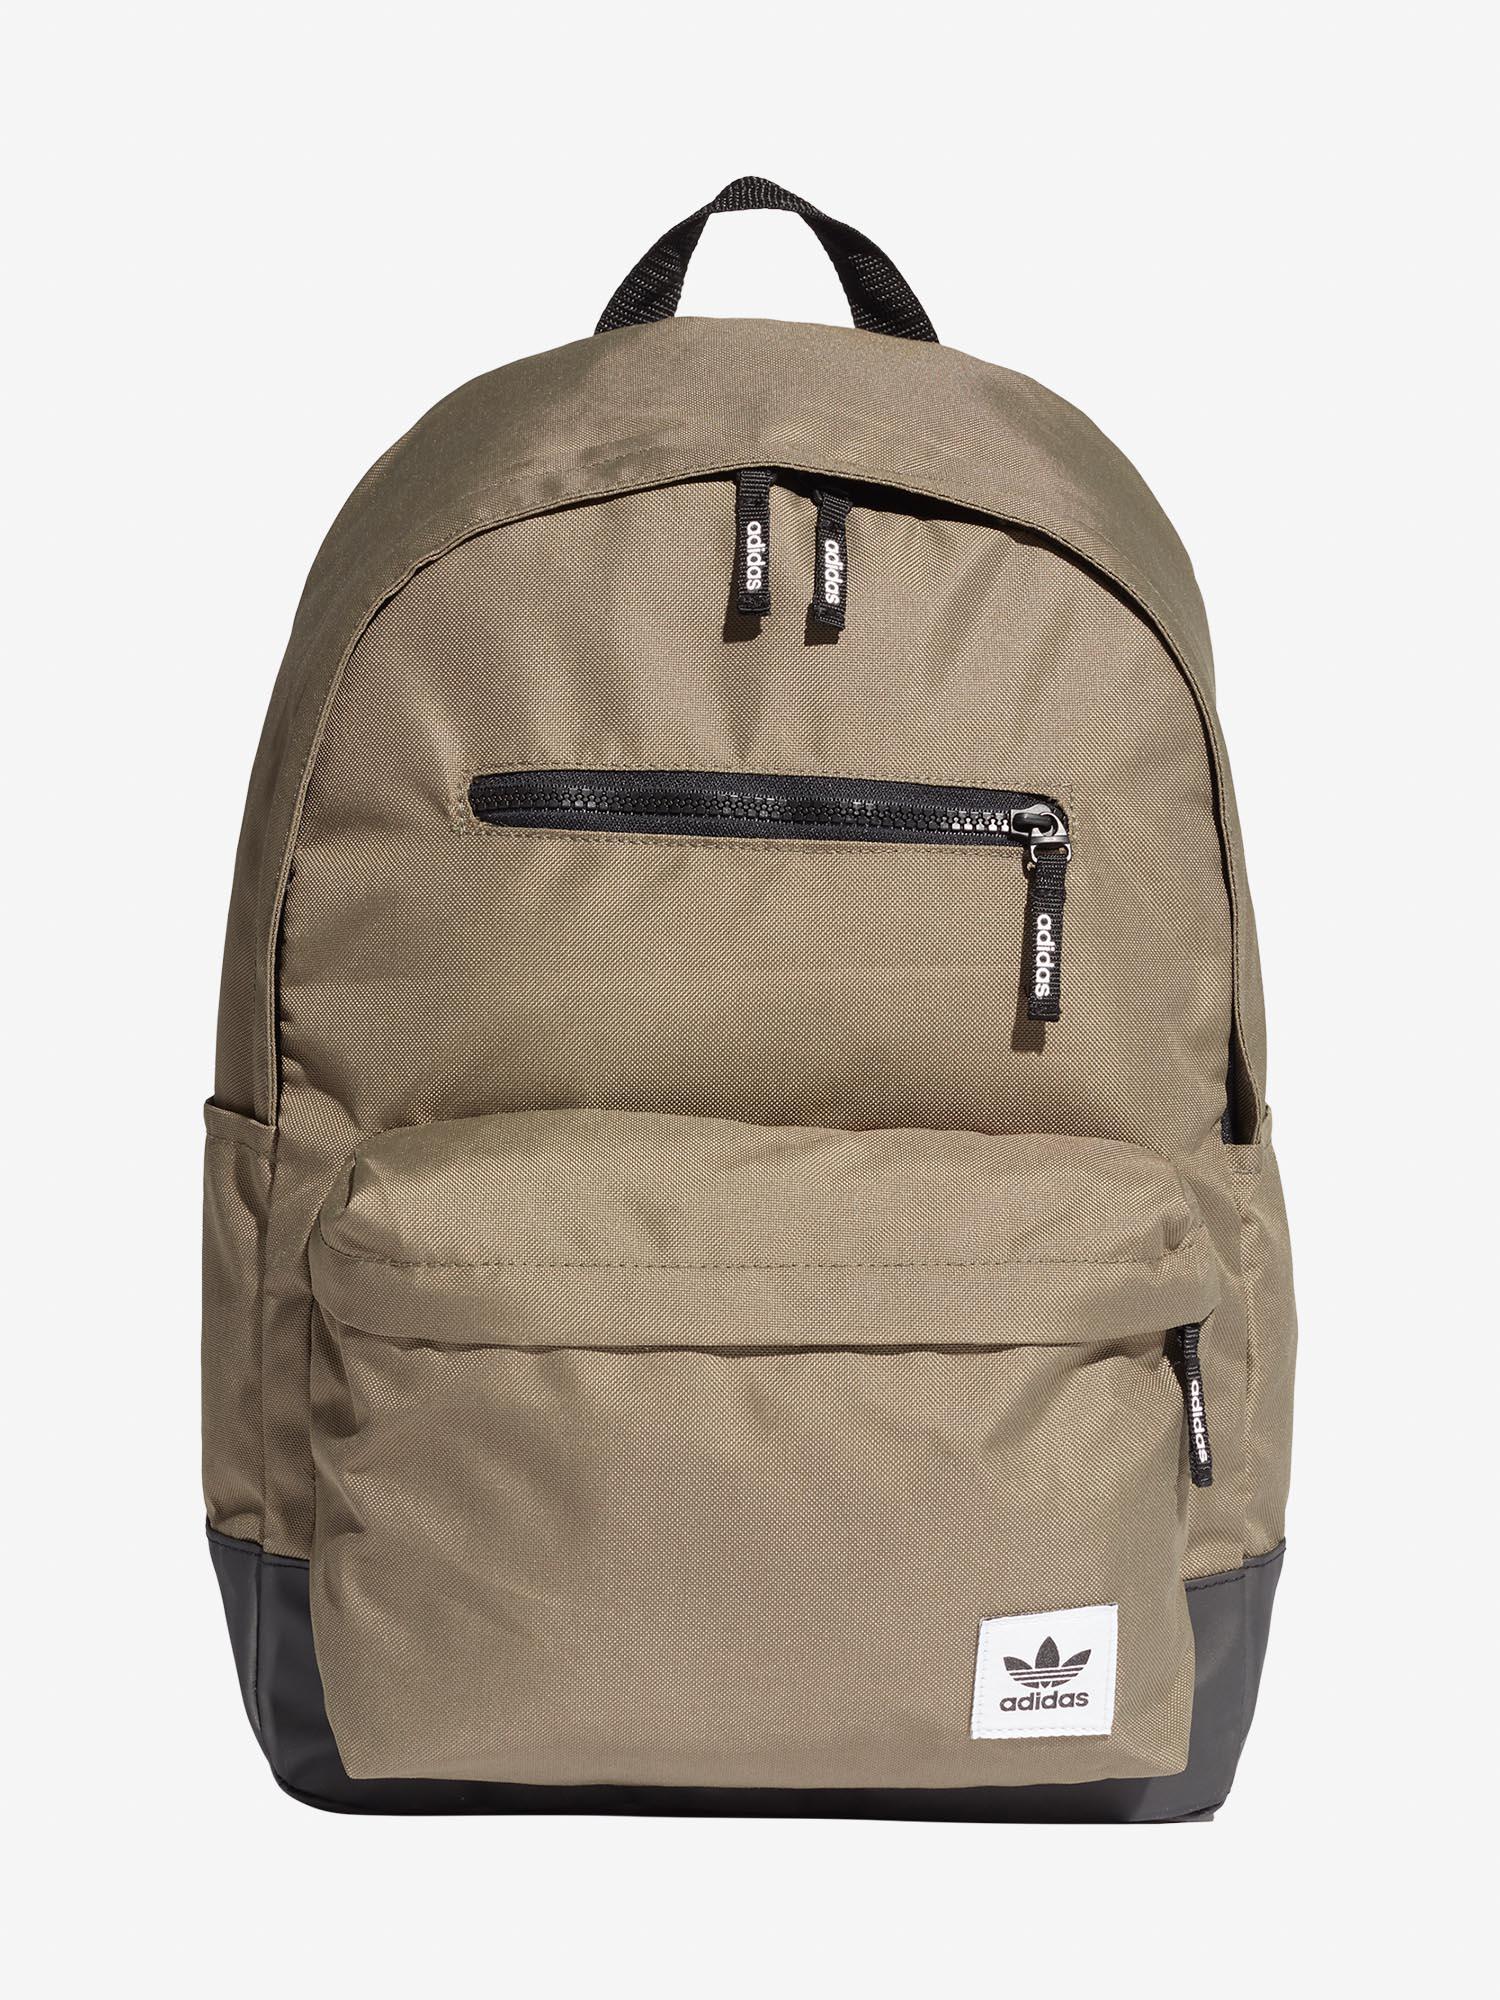 Adidas Originals Pe Classic Bp Backpack